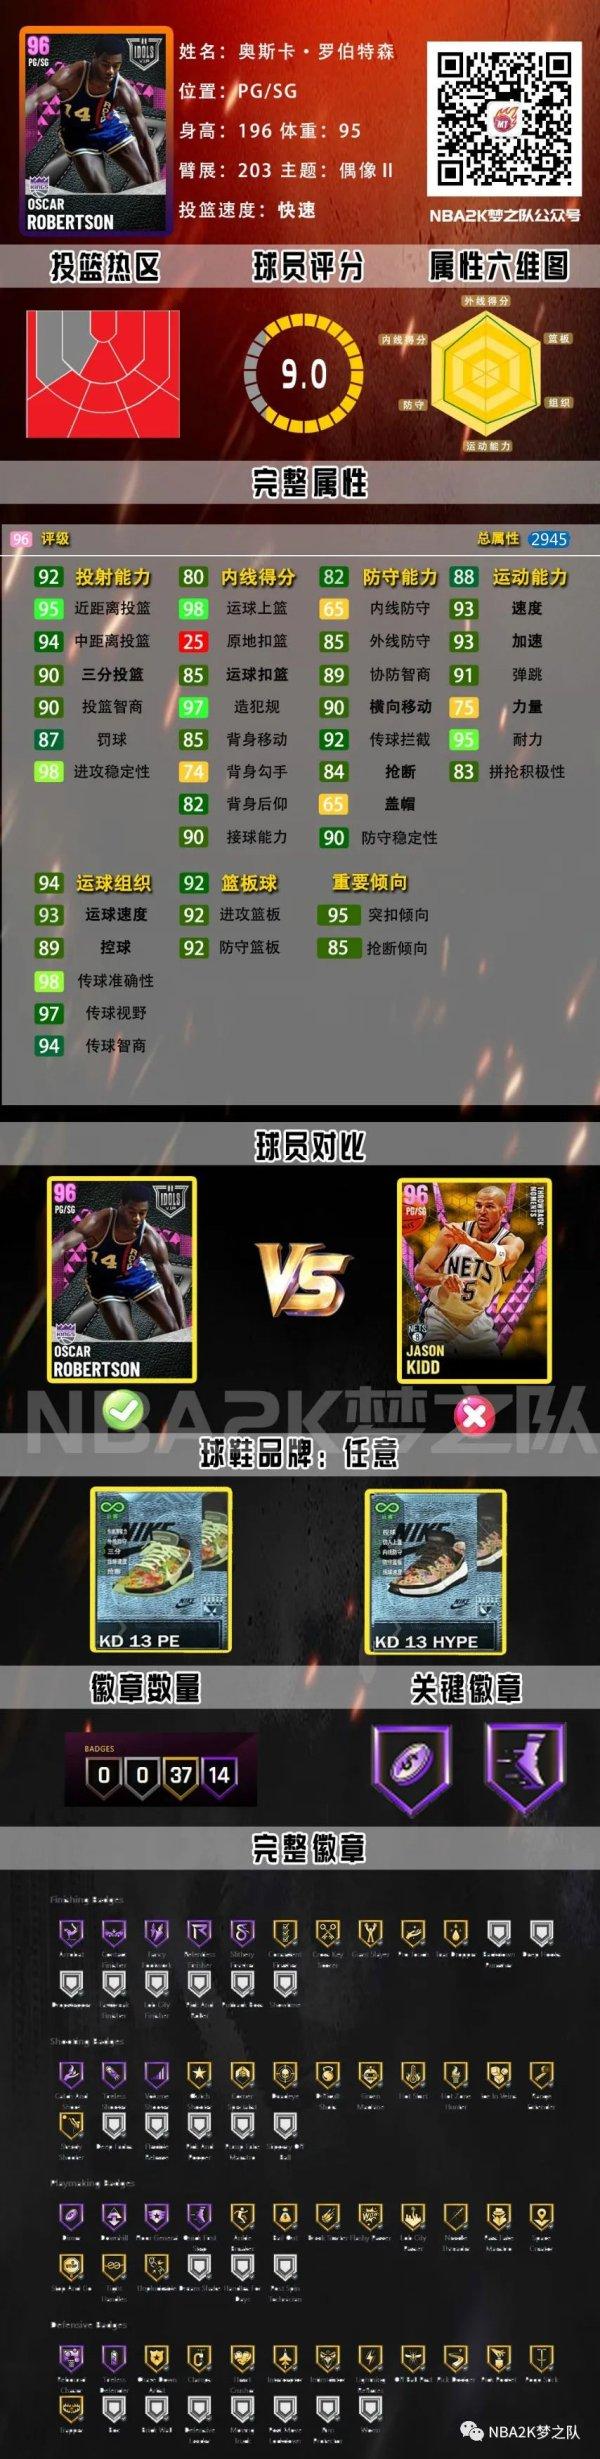 《NBA 2K21》濃眉哥領銜偶像卡包球員卡 5